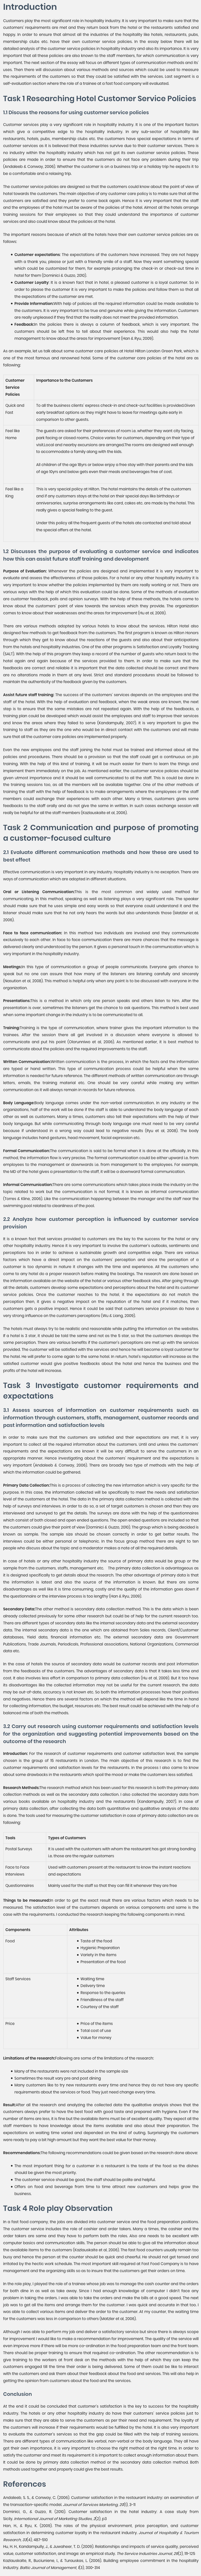 Unit 3 Customer Service Assignment Help